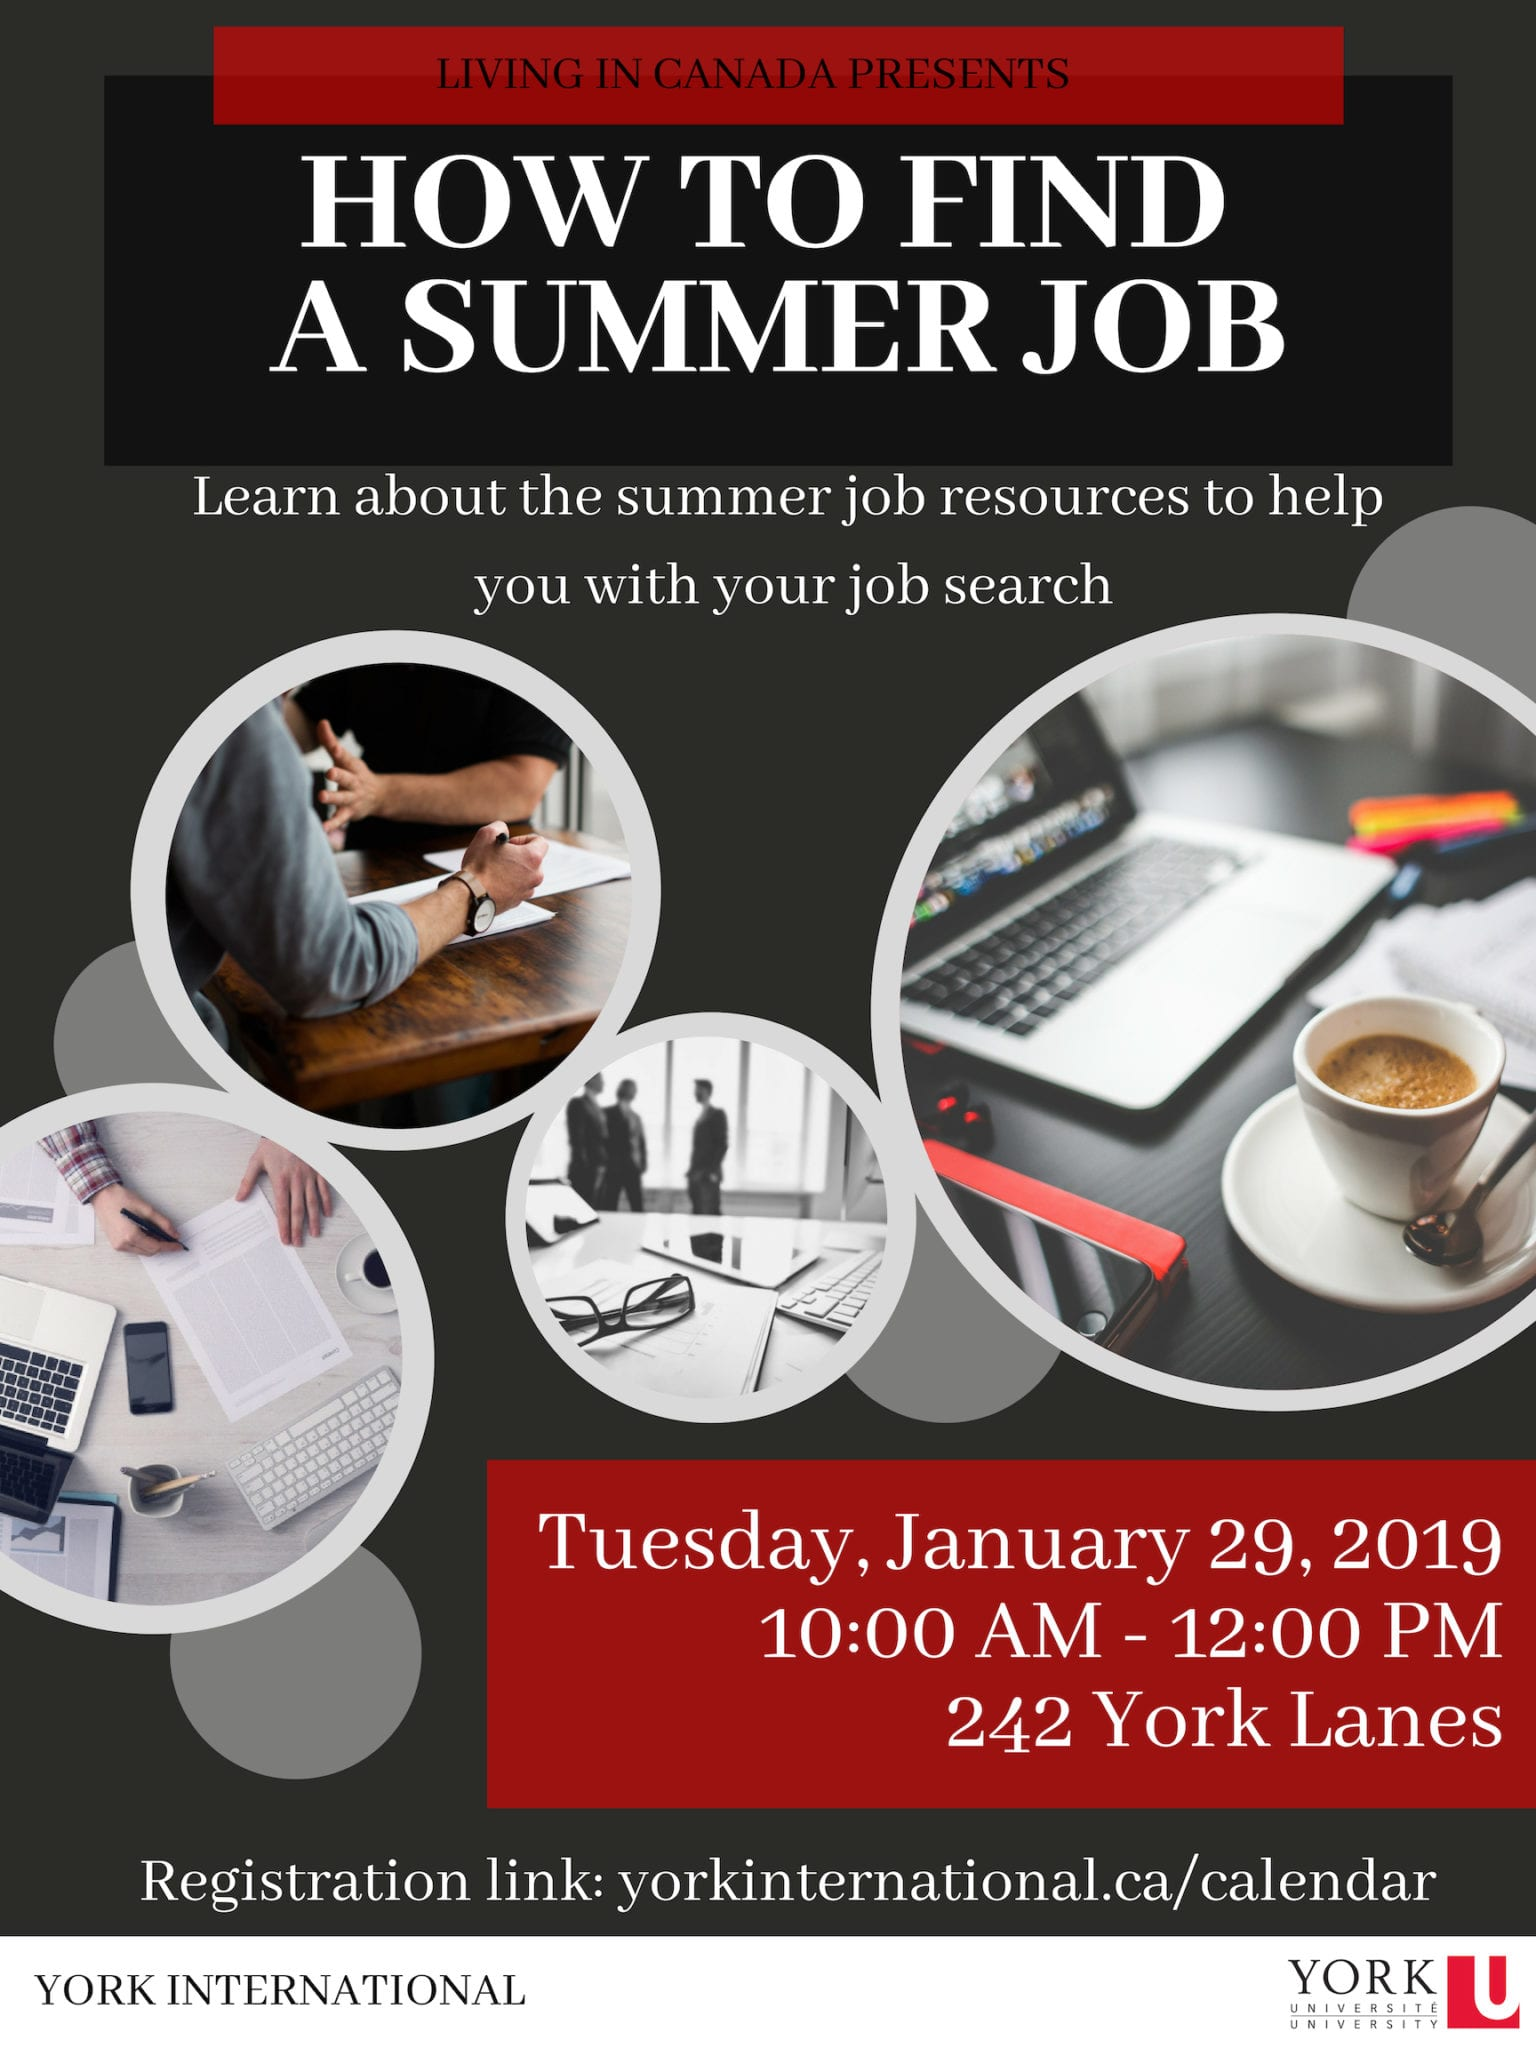 How to Find a Summer Job Workshop @ 242 York Lanes